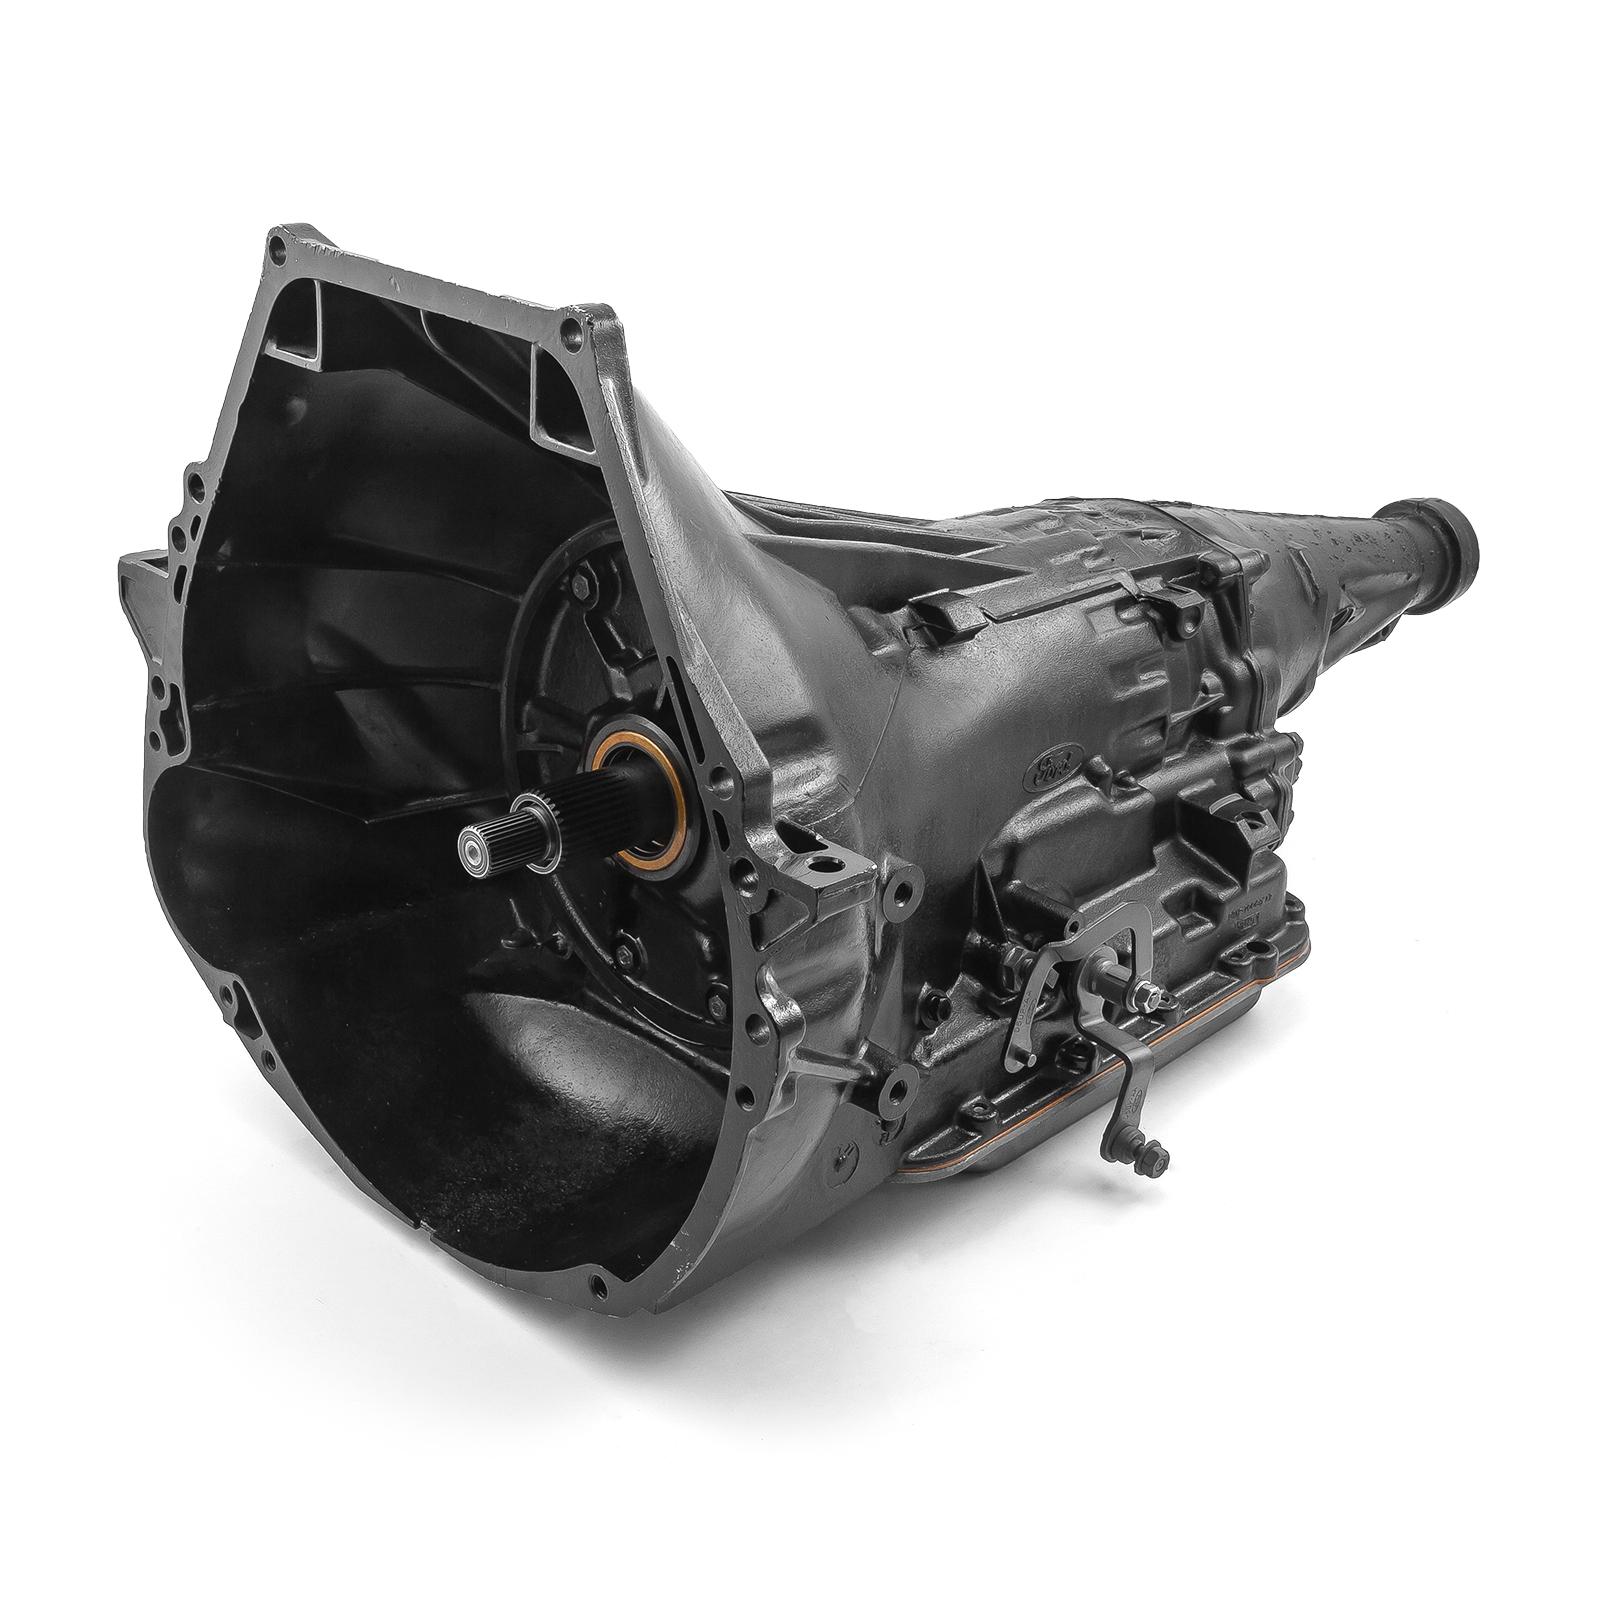 Ford Big Block 351m 400 429 460 C6 Performance Rebuilt Automatic Transmission